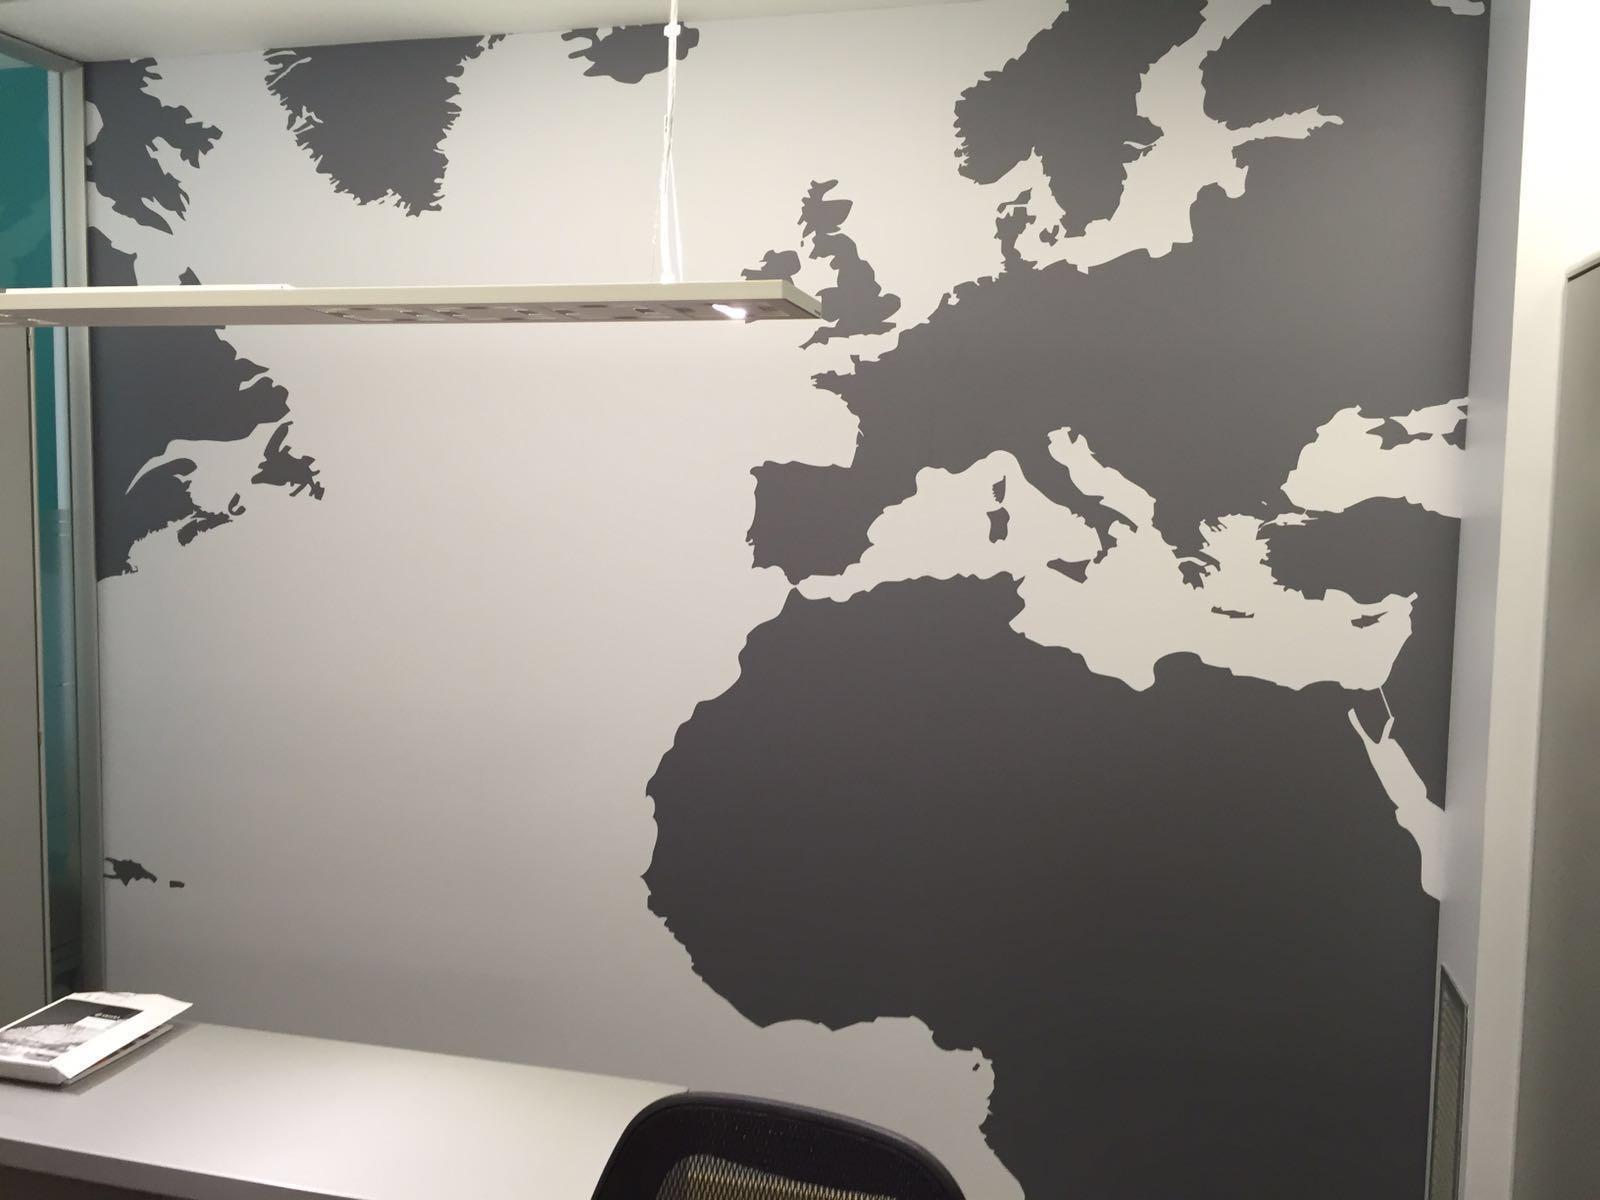 Decoraci n mural para pared de oficina sector impresi n - Decoracion en pared ...